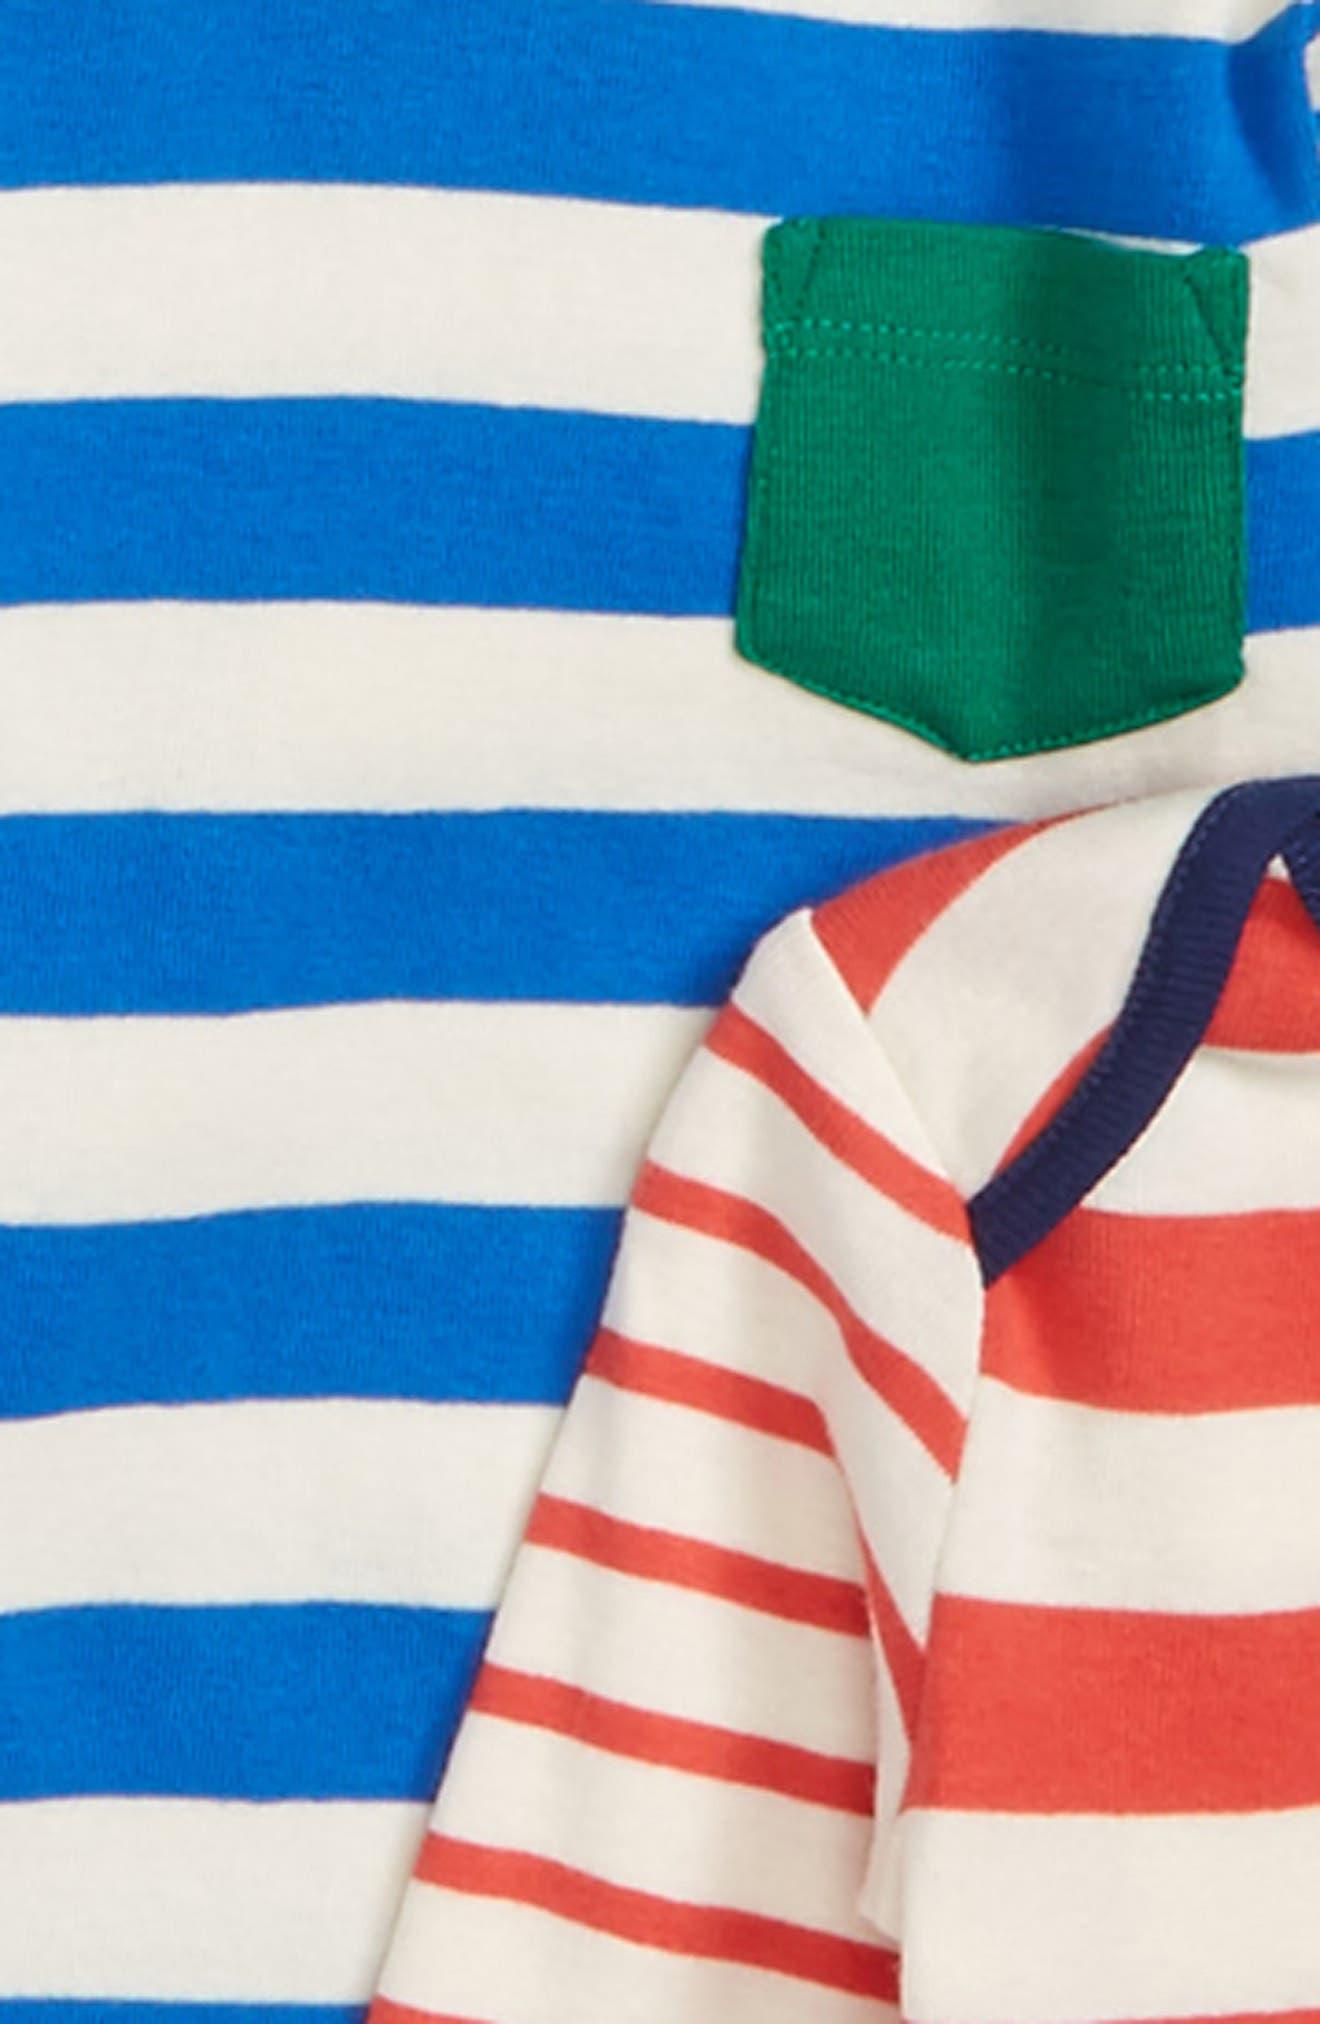 Stripy 5-Pack Cotton Bodysuits,                             Alternate thumbnail 2, color,                             Multi Stripes